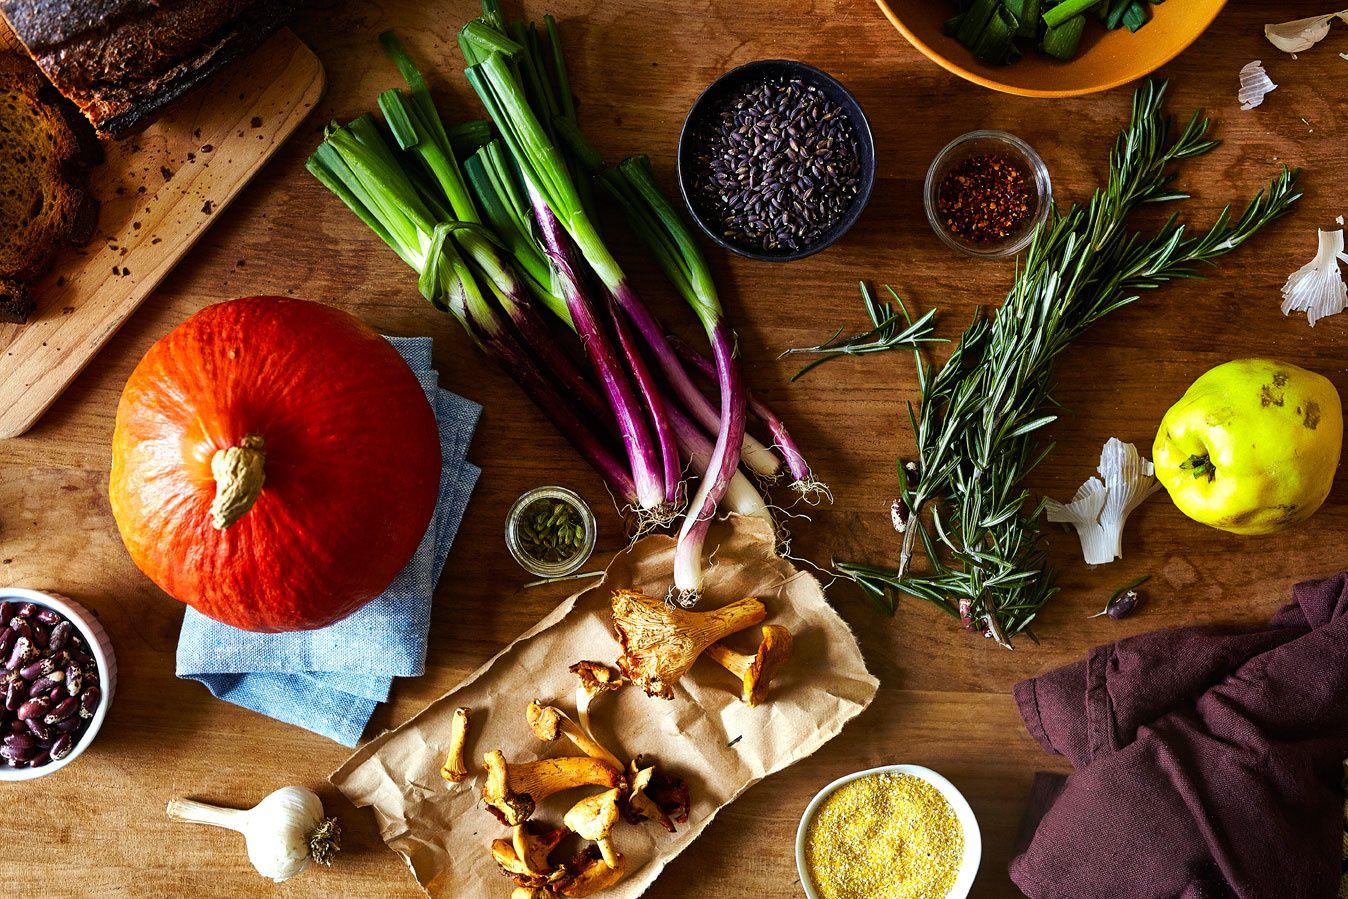 Julia gartland is a brooklyn based freelance photographer food julia gartland is a brooklyn based freelance photographer food stylist and recipe developer forumfinder Choice Image